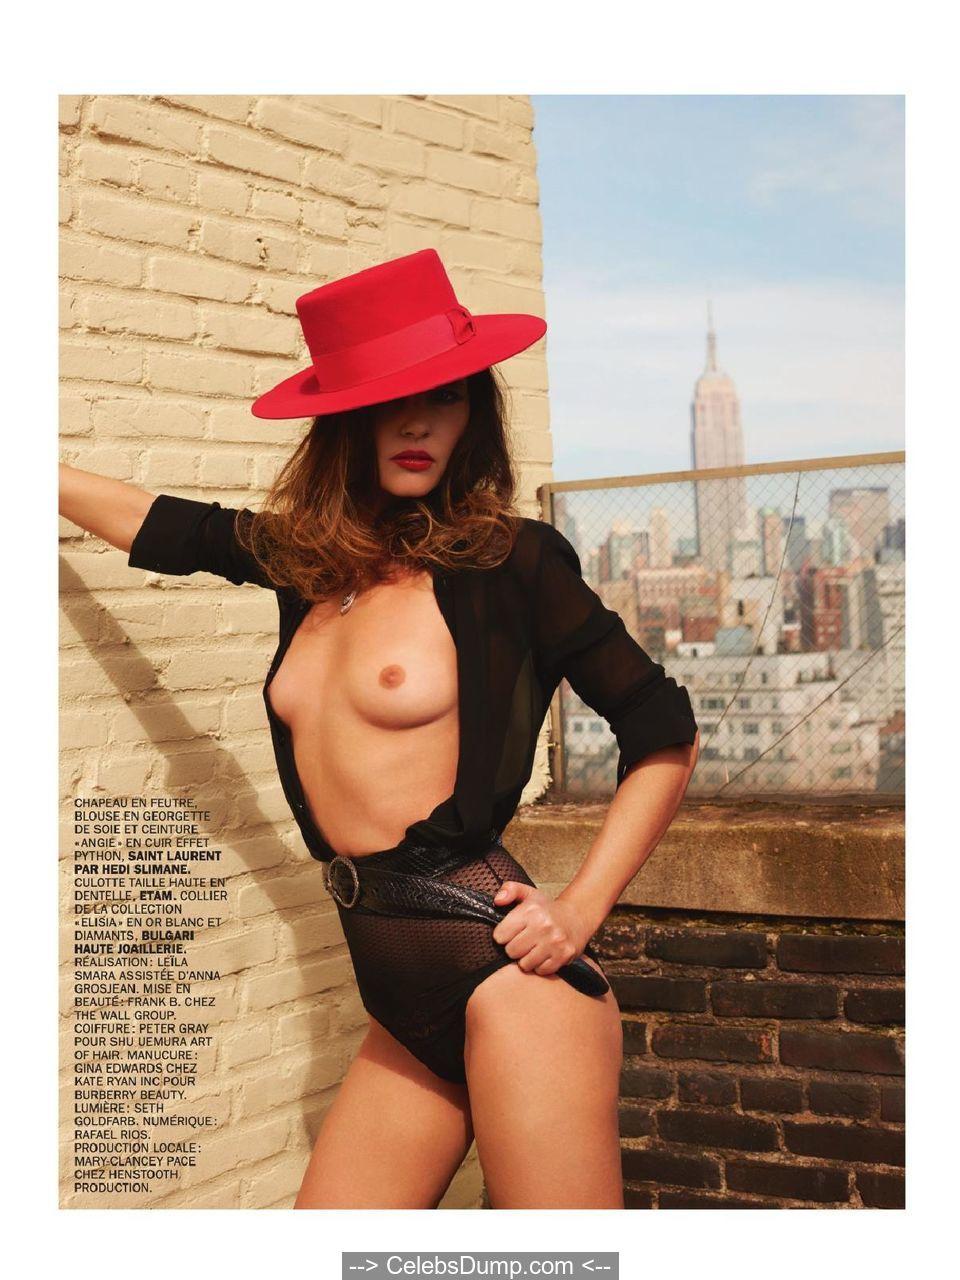 Virginie Ledoyen topless